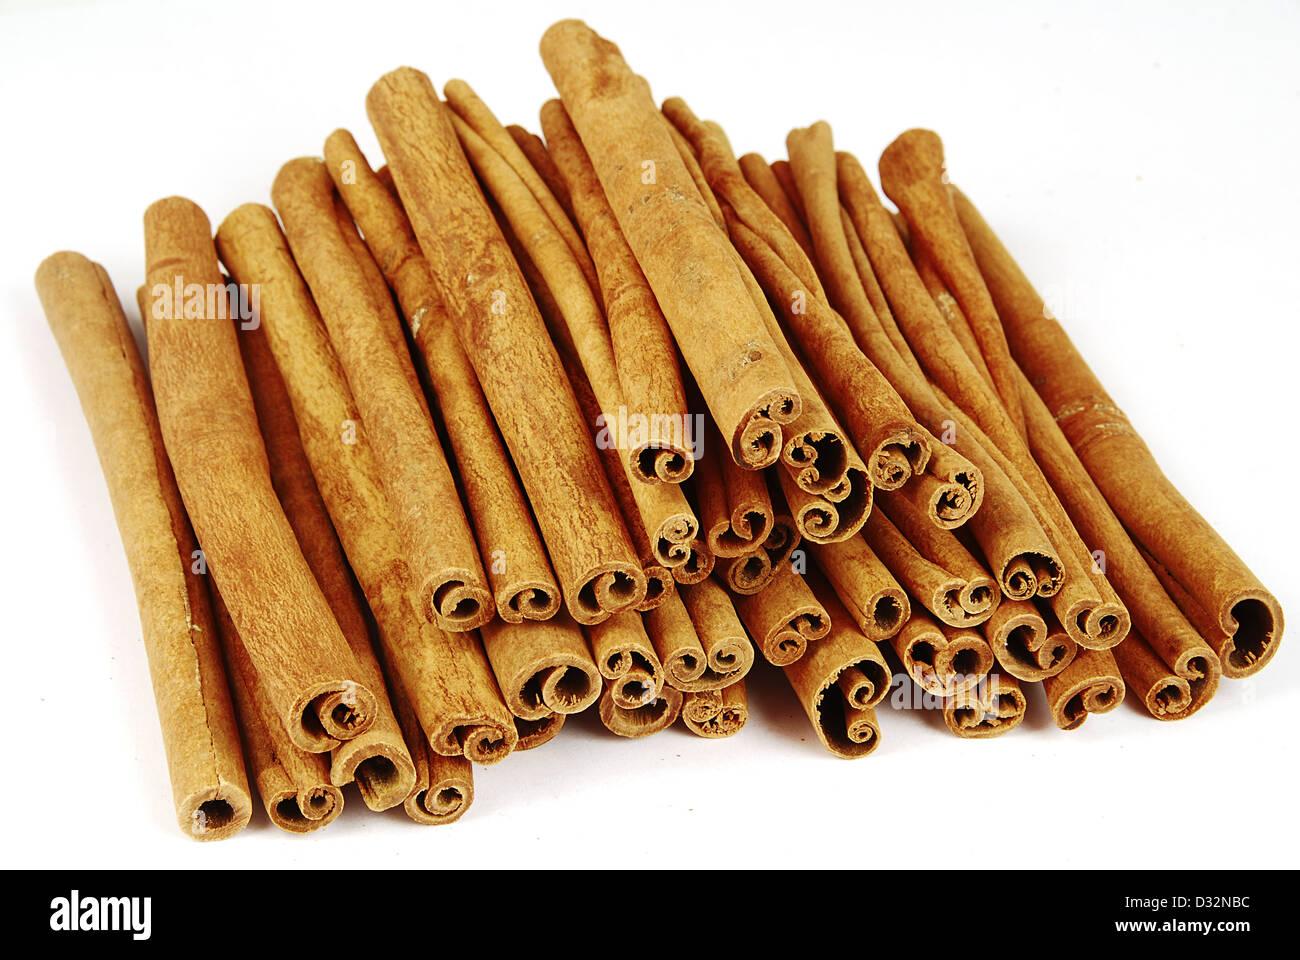 Big pile of spicy cinnamon sticks isolated Stock Photo: 53535760 - Alamy